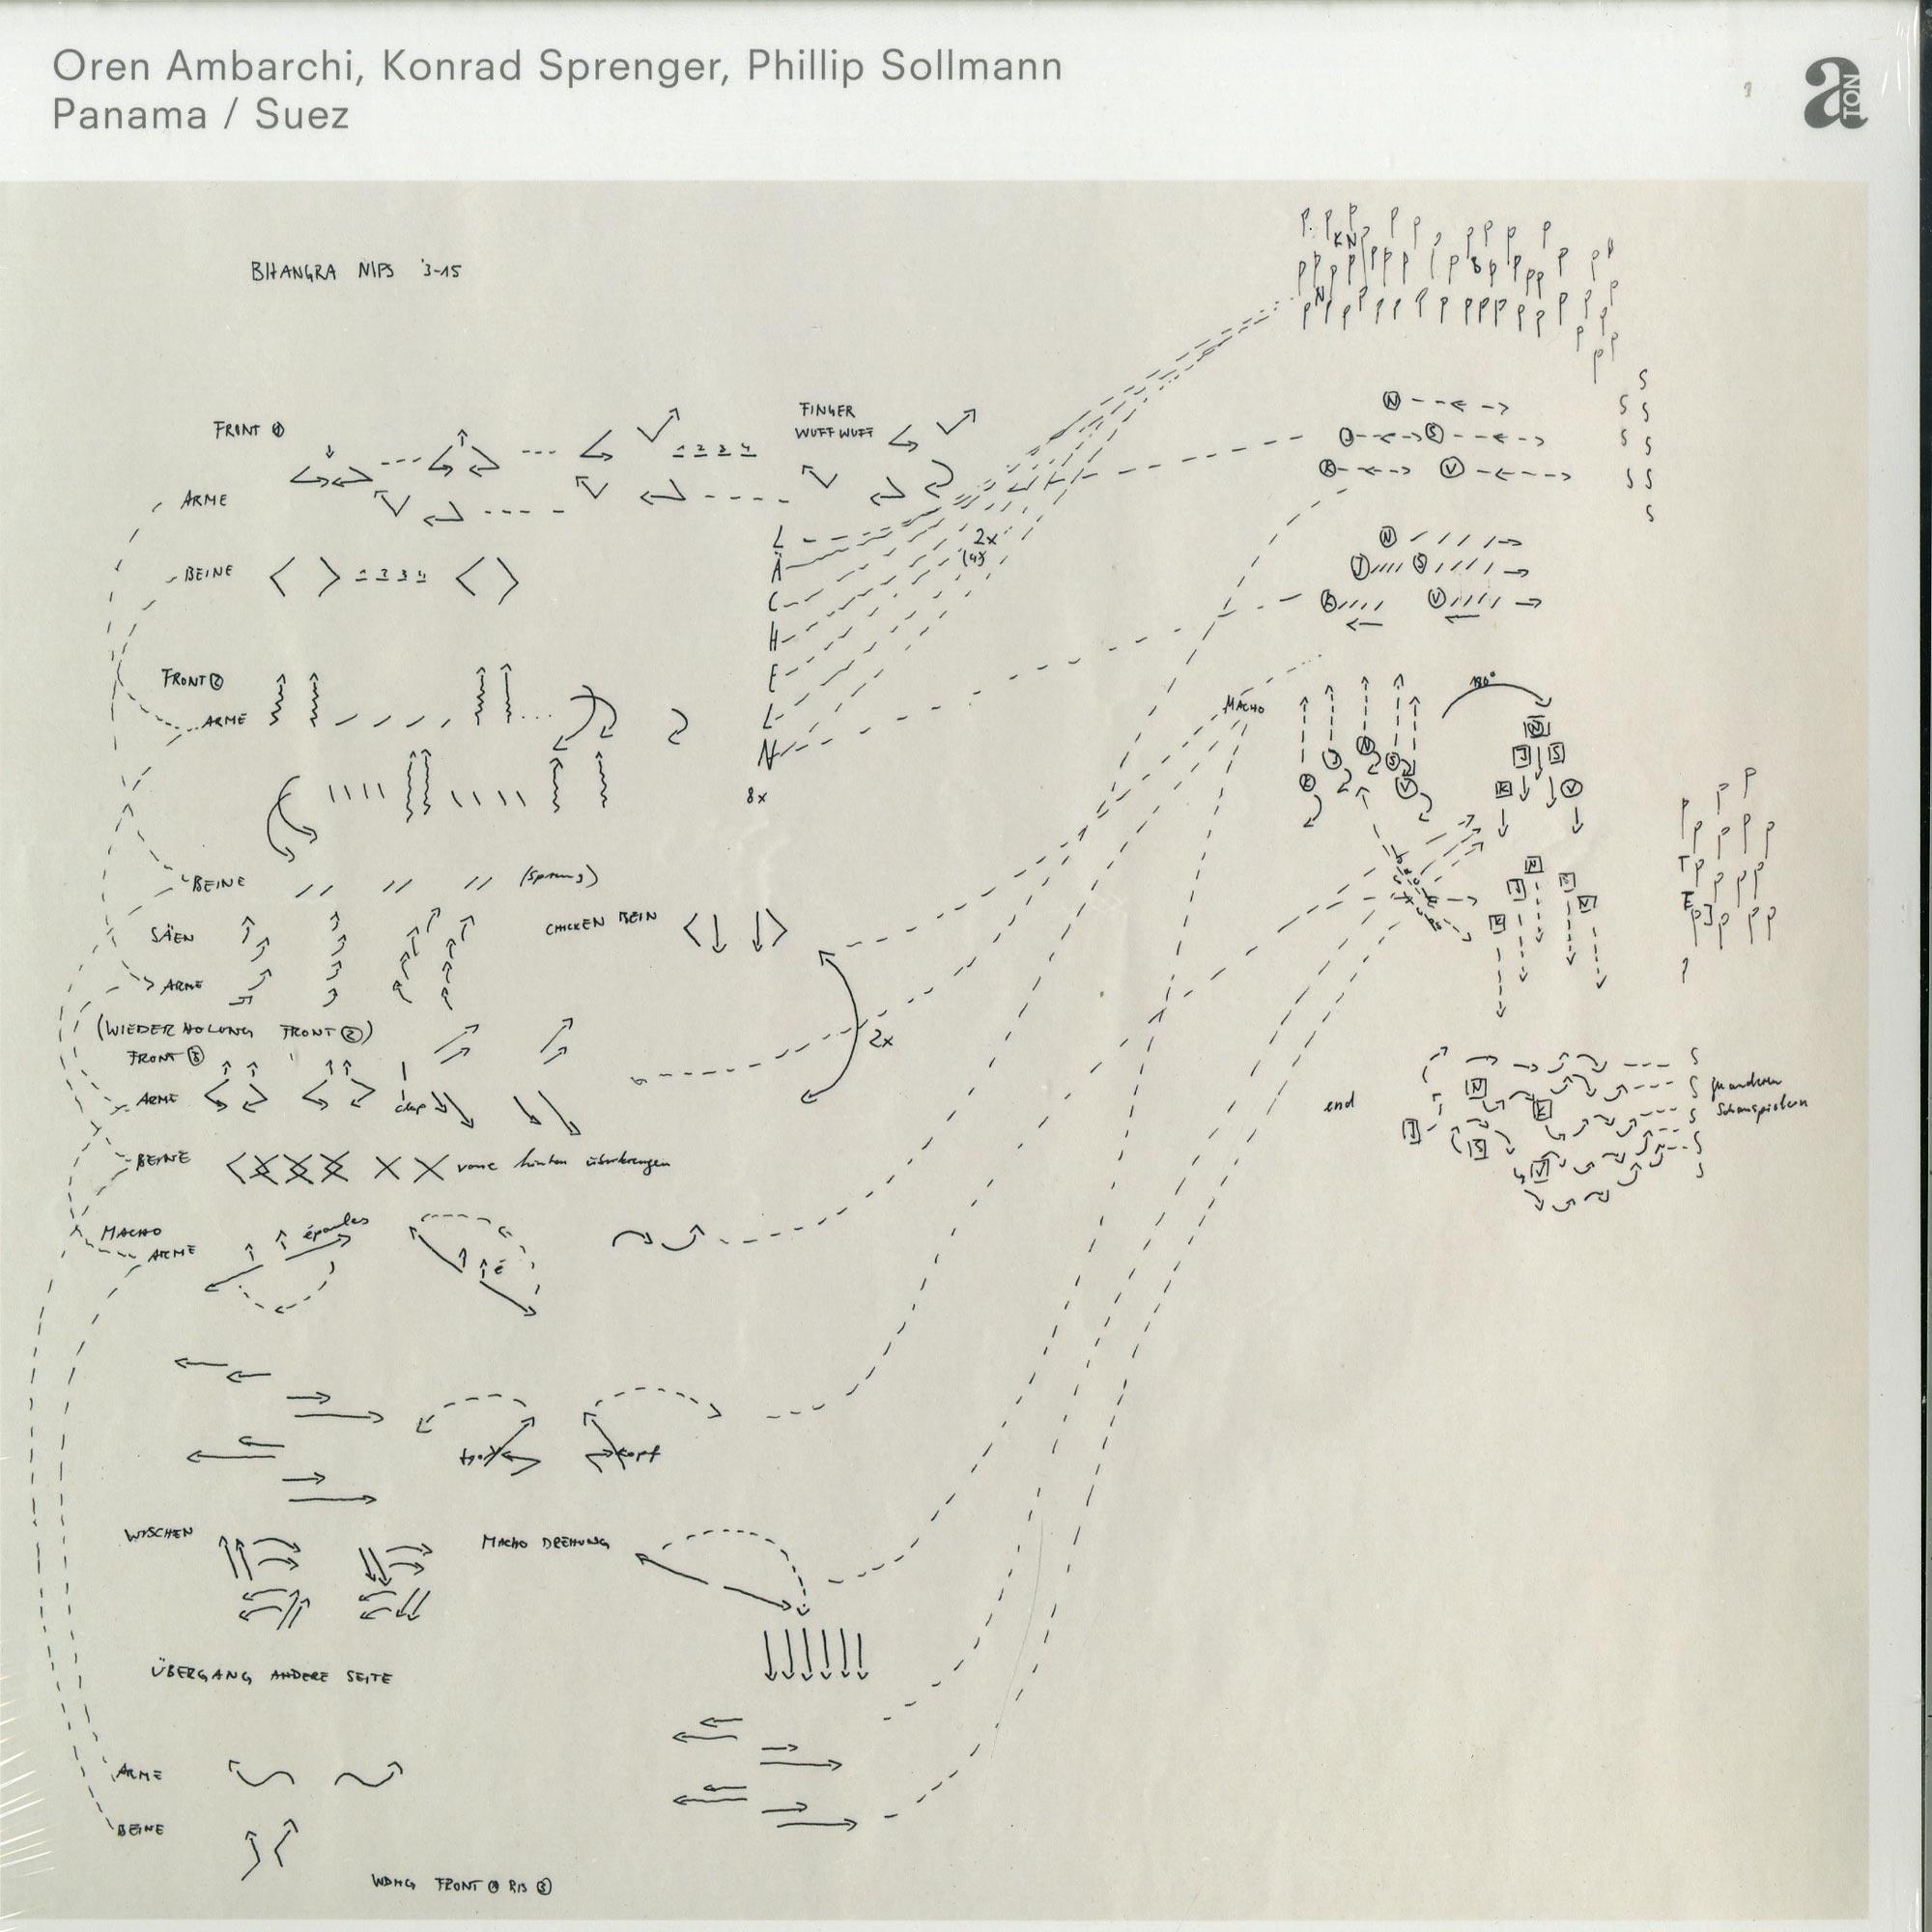 Oren Ambarchi / Konrad Sprenger / Phillip Sollmann - PANAMA / SUEZ